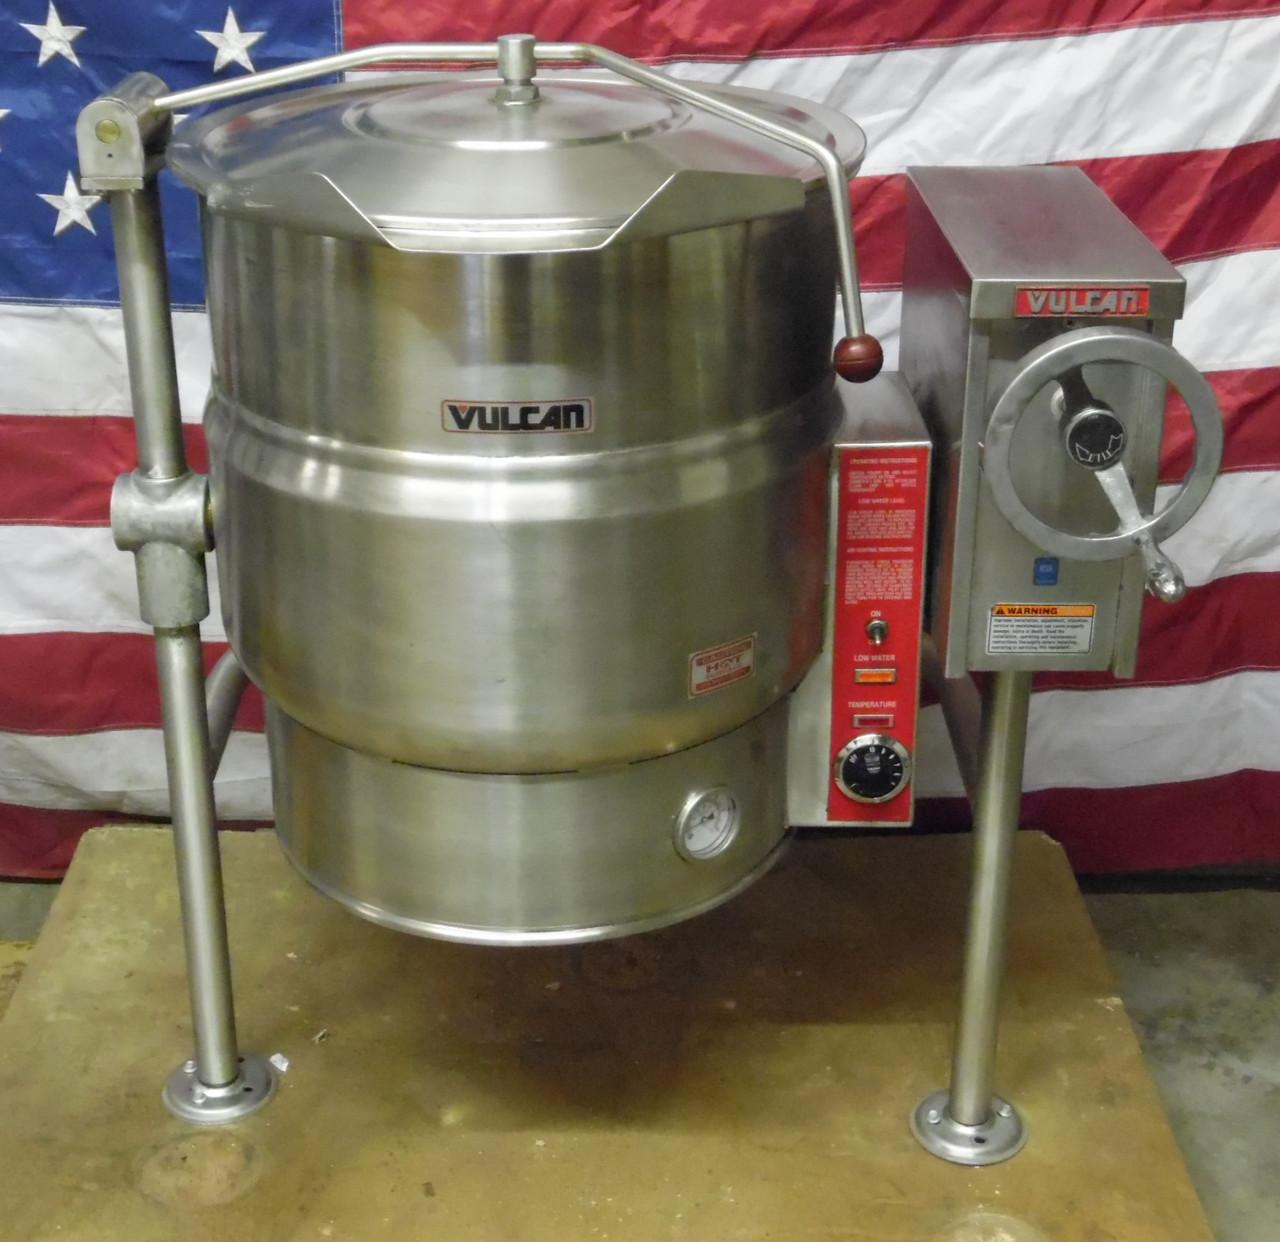 Vulcan VELT-20 208-240V 1-3 Phase Electric Tilting Steam Jacketed Kettle